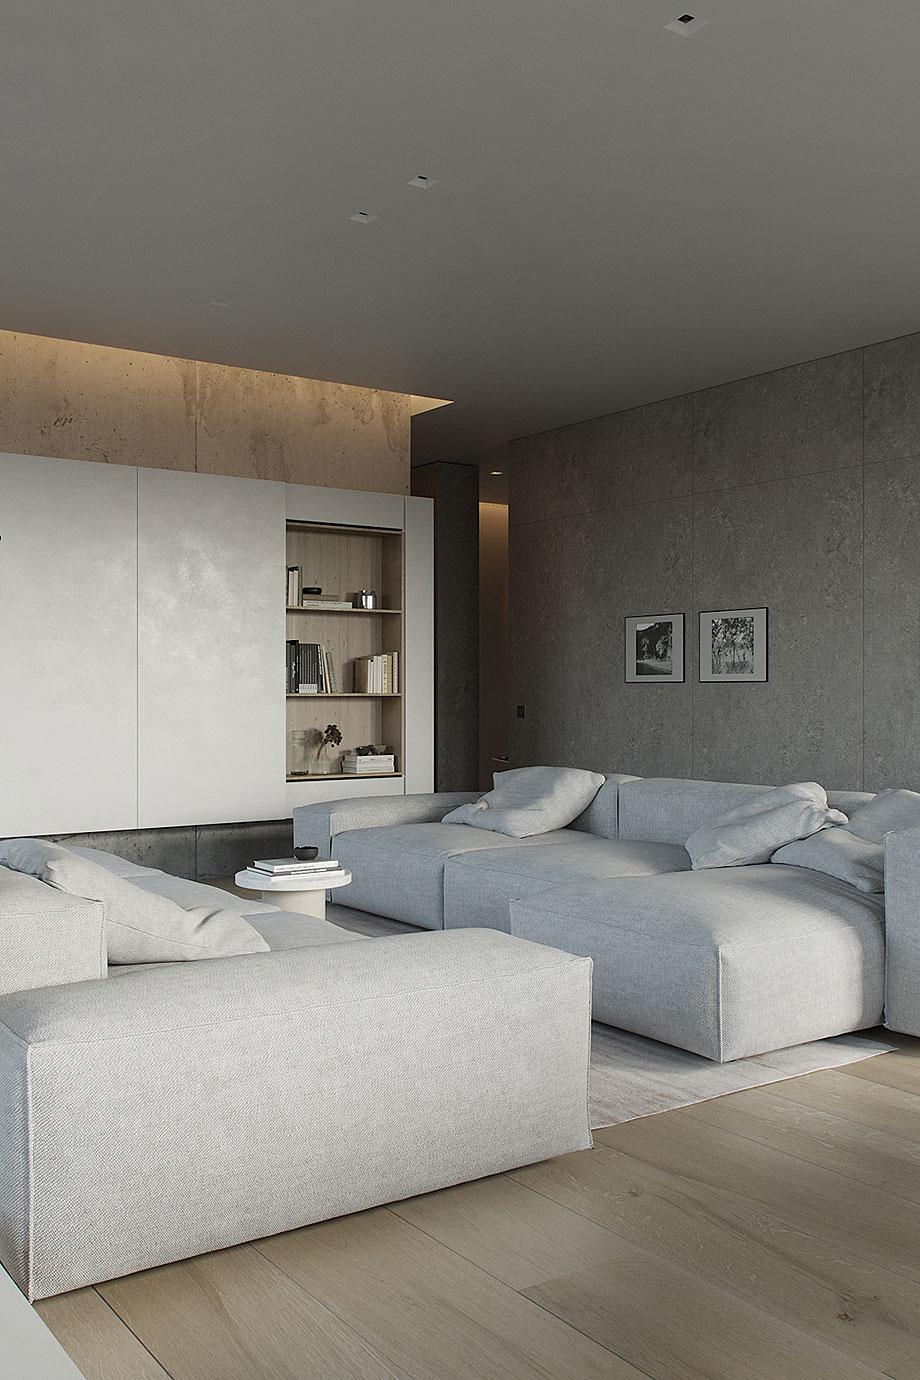 apartamento en moscu de kodd bureau (6) - foto daria koloskova